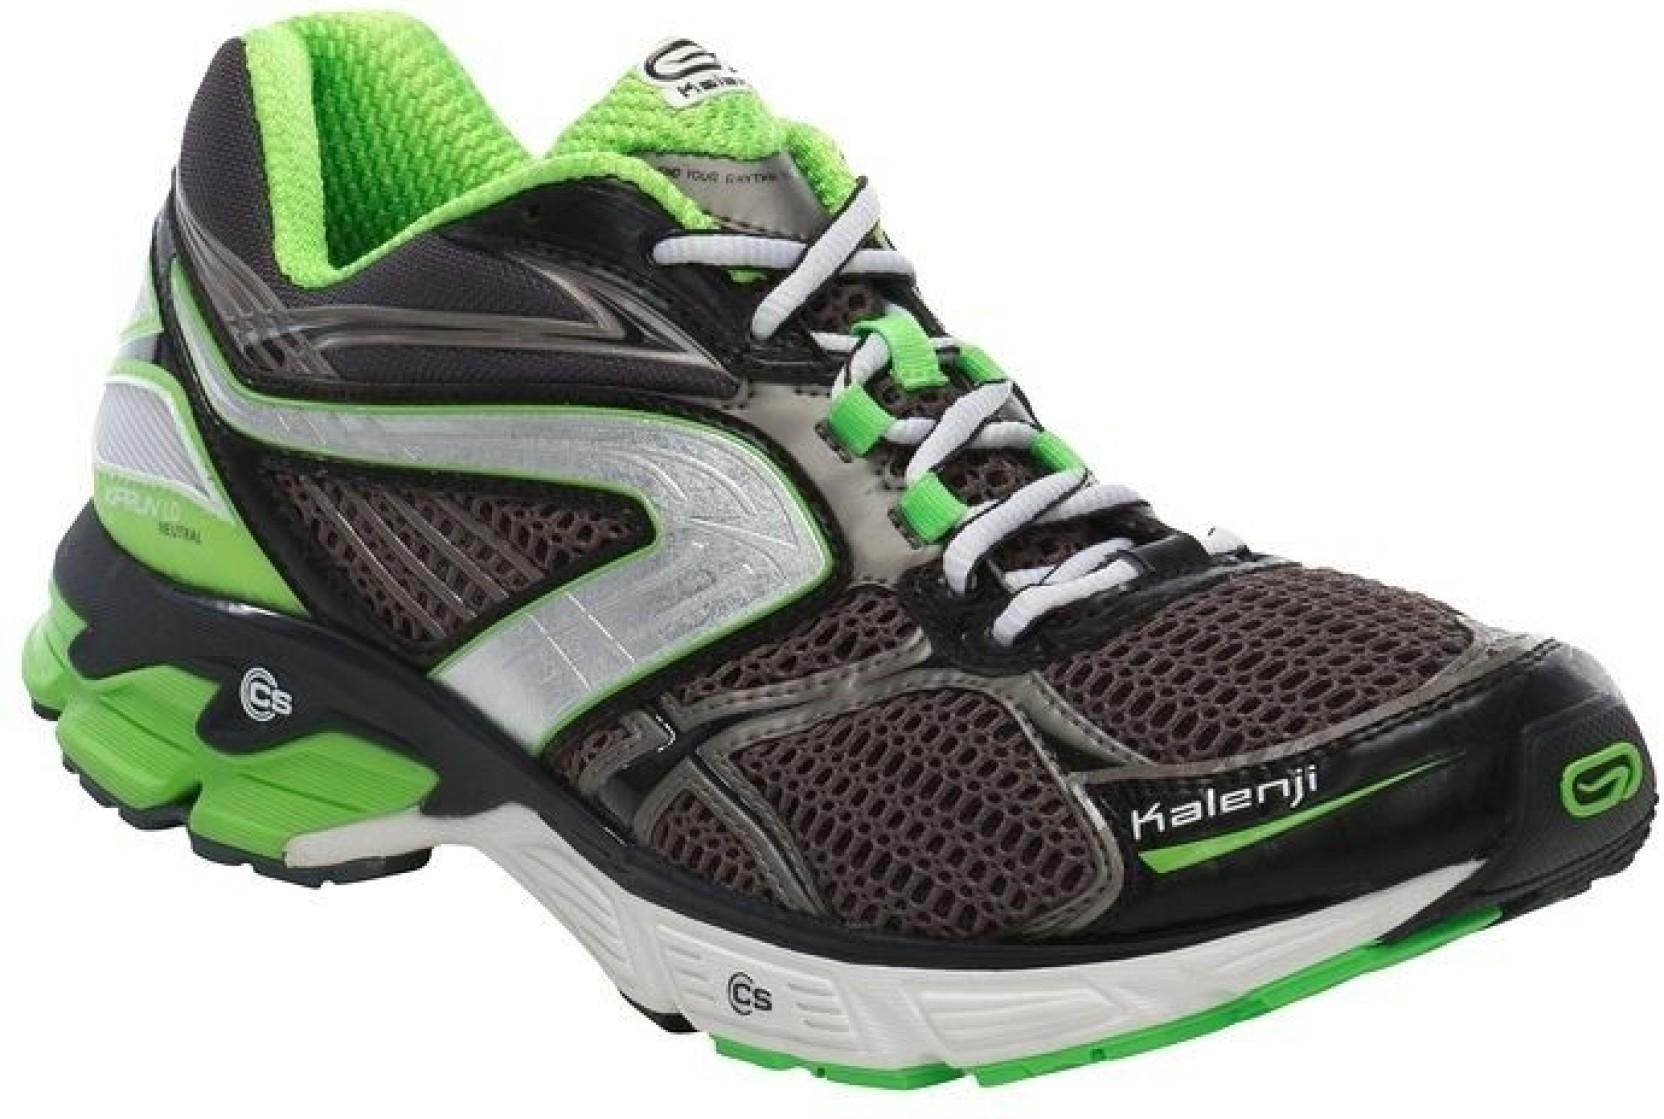 Kalenji By Decathlon Kiprun Ld Blackgreen Running Shoes